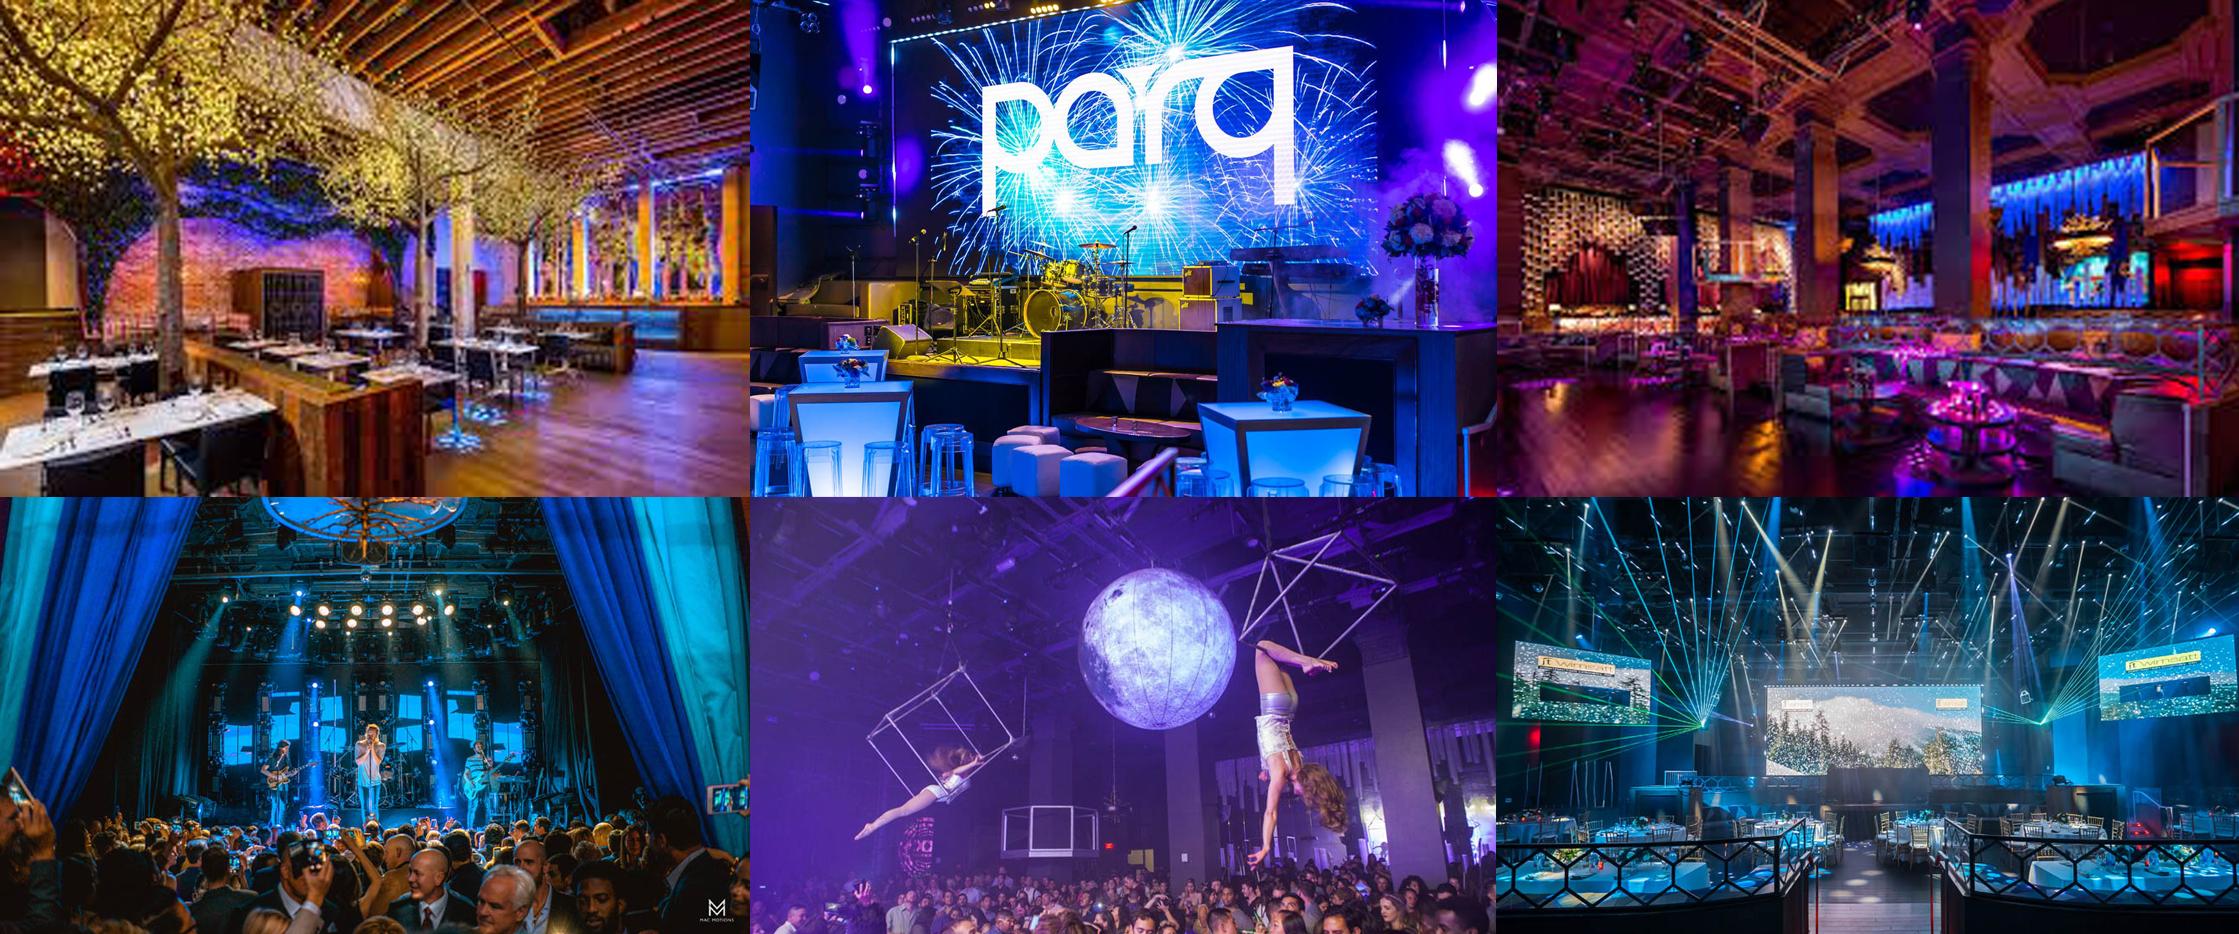 parq nightclub and restaurant san diego